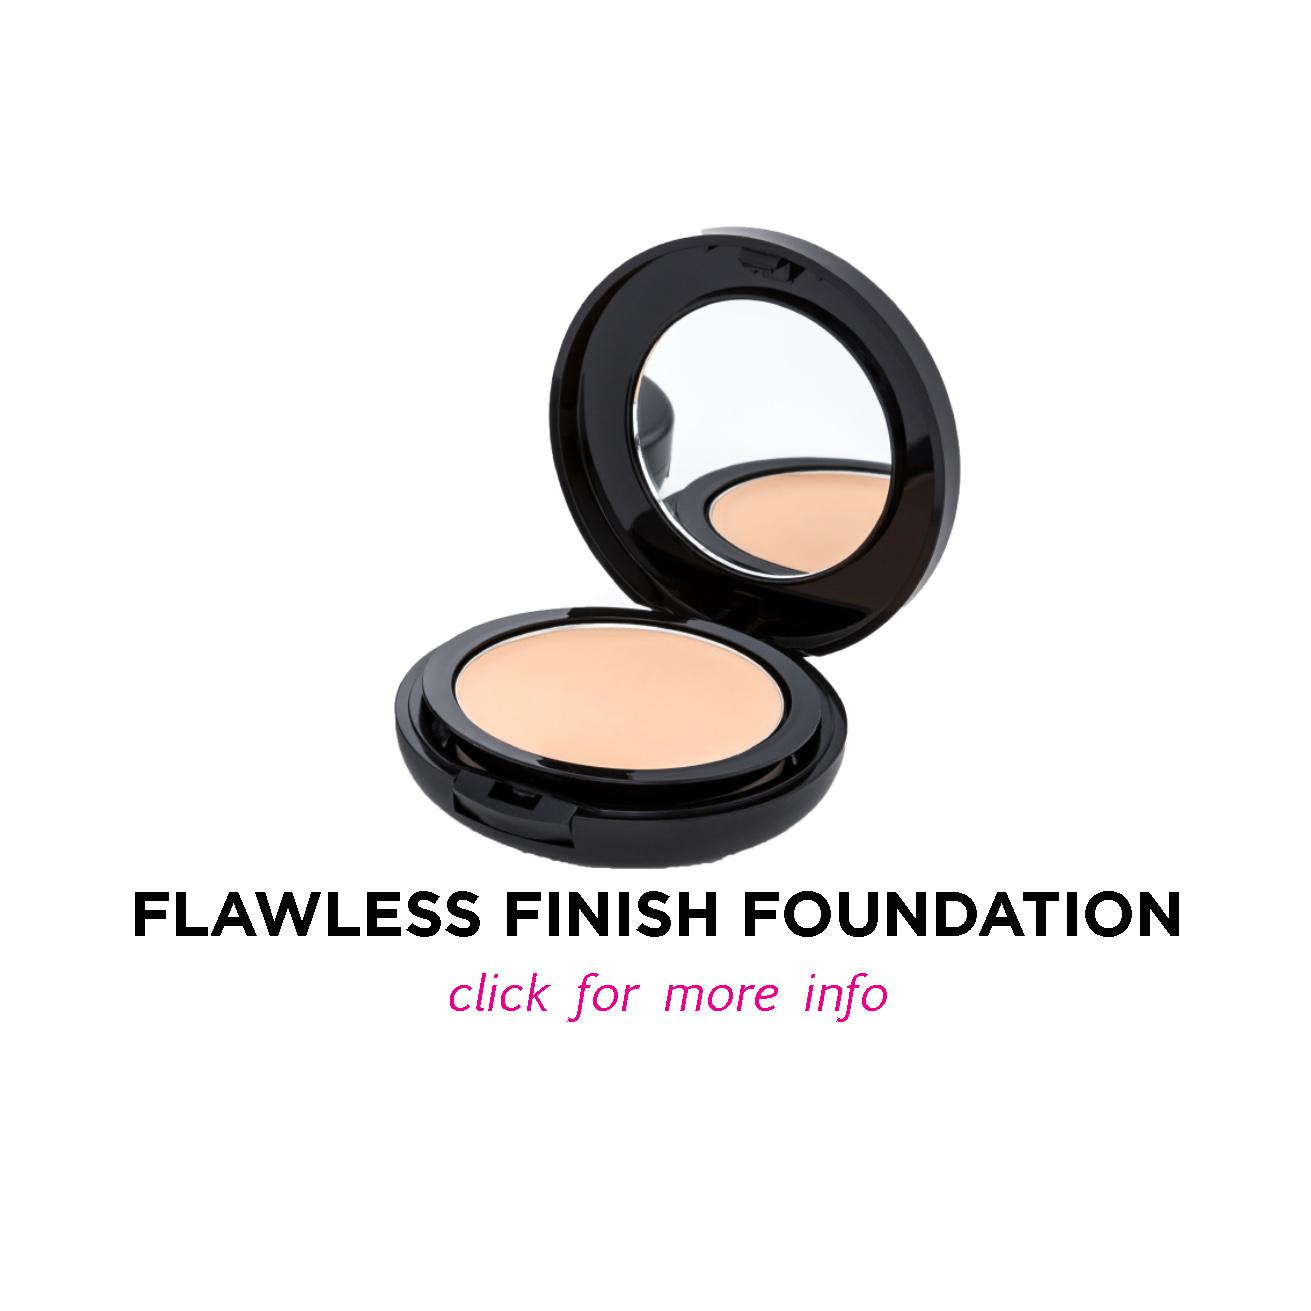 Flawless Finish Finish